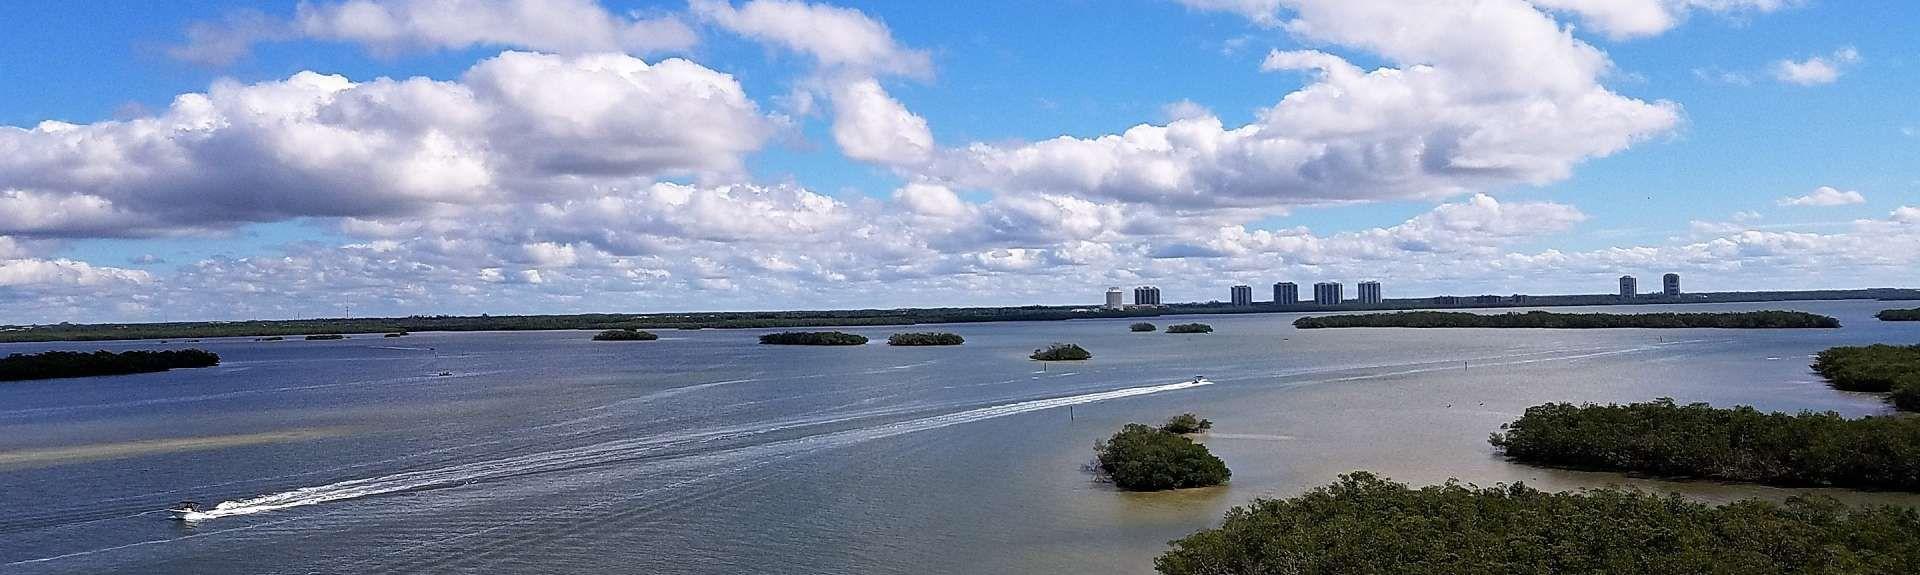 Villas, Florida, Forente Stater